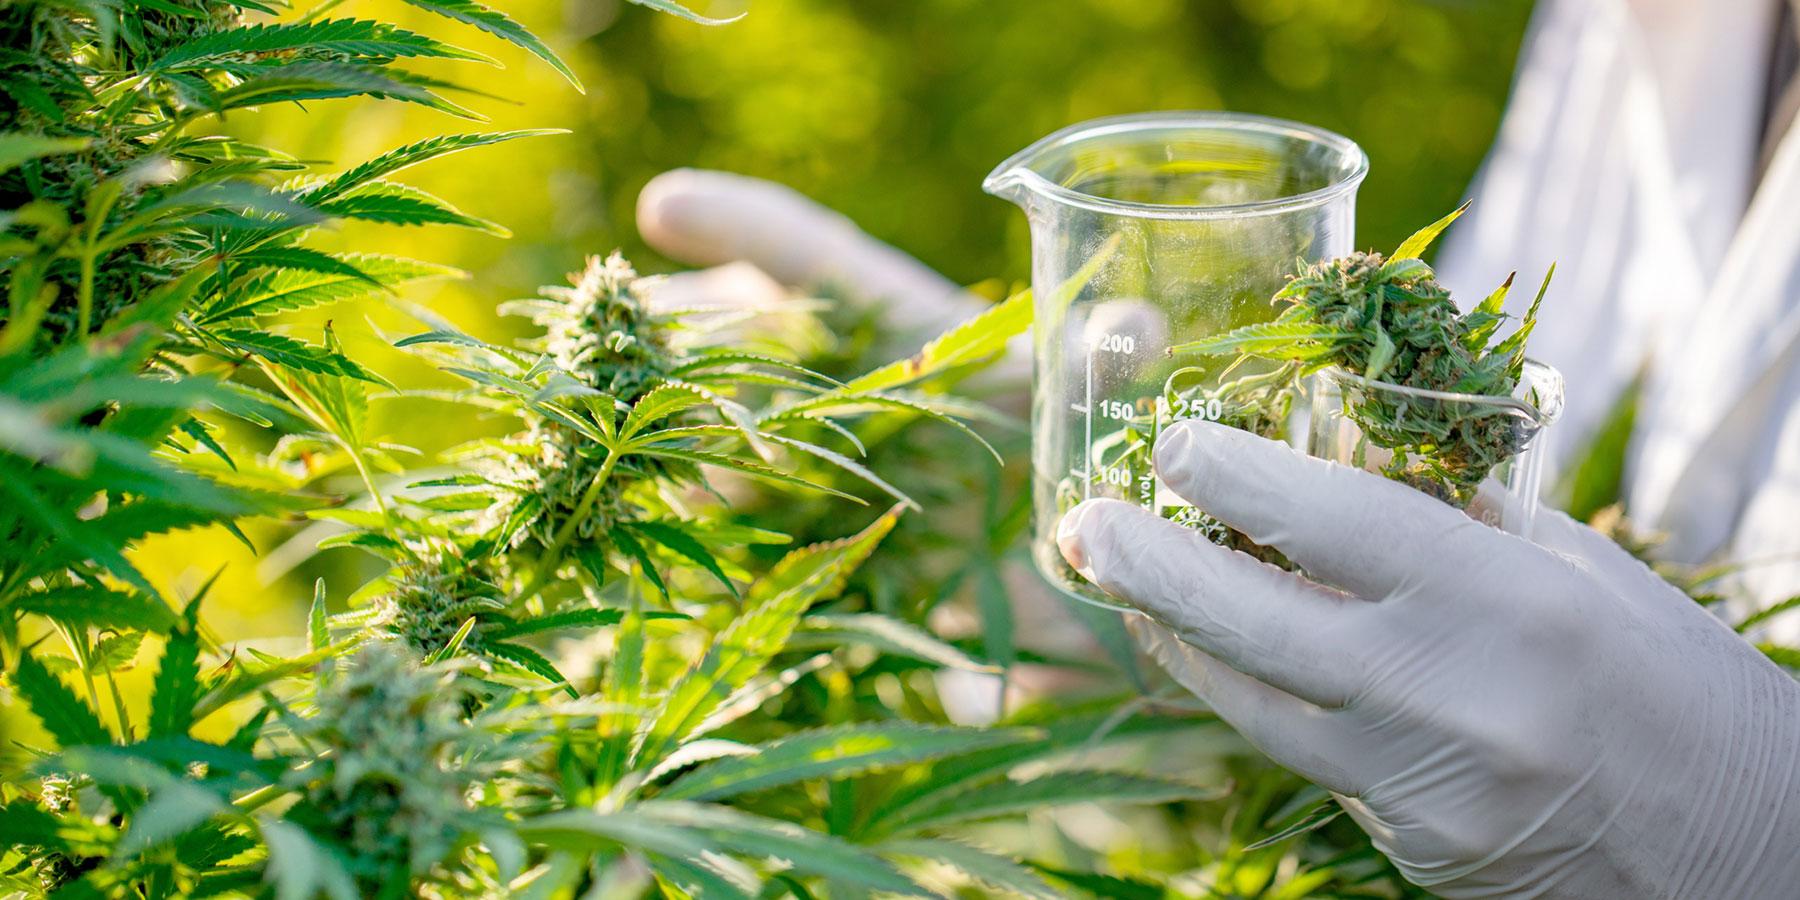 THC Testing in Cannabis and Hemp